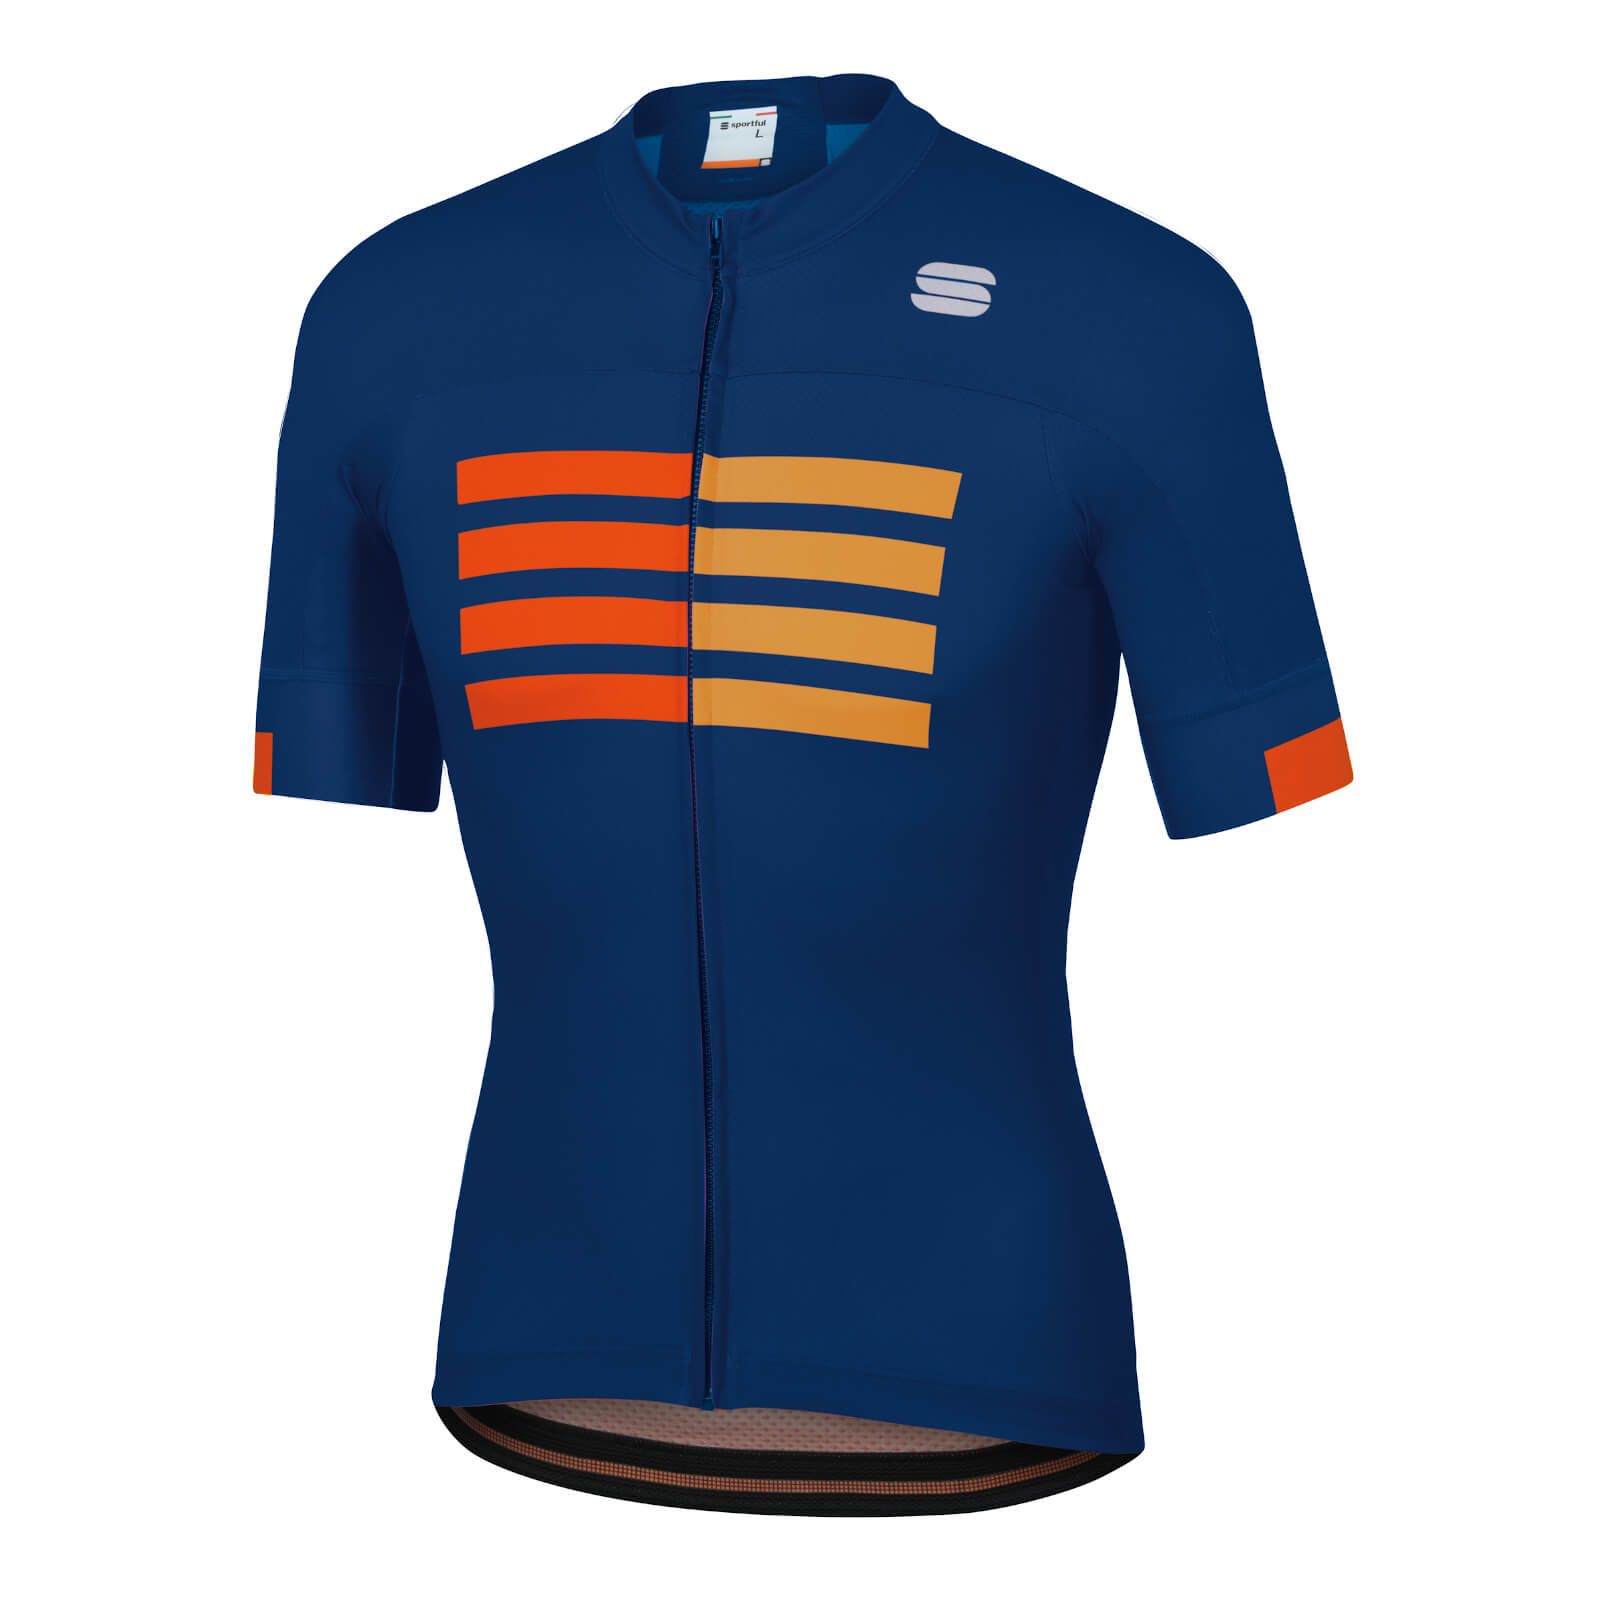 Sportful Wire Jersey - XL - Blue Twilight/Fire Red/Gold